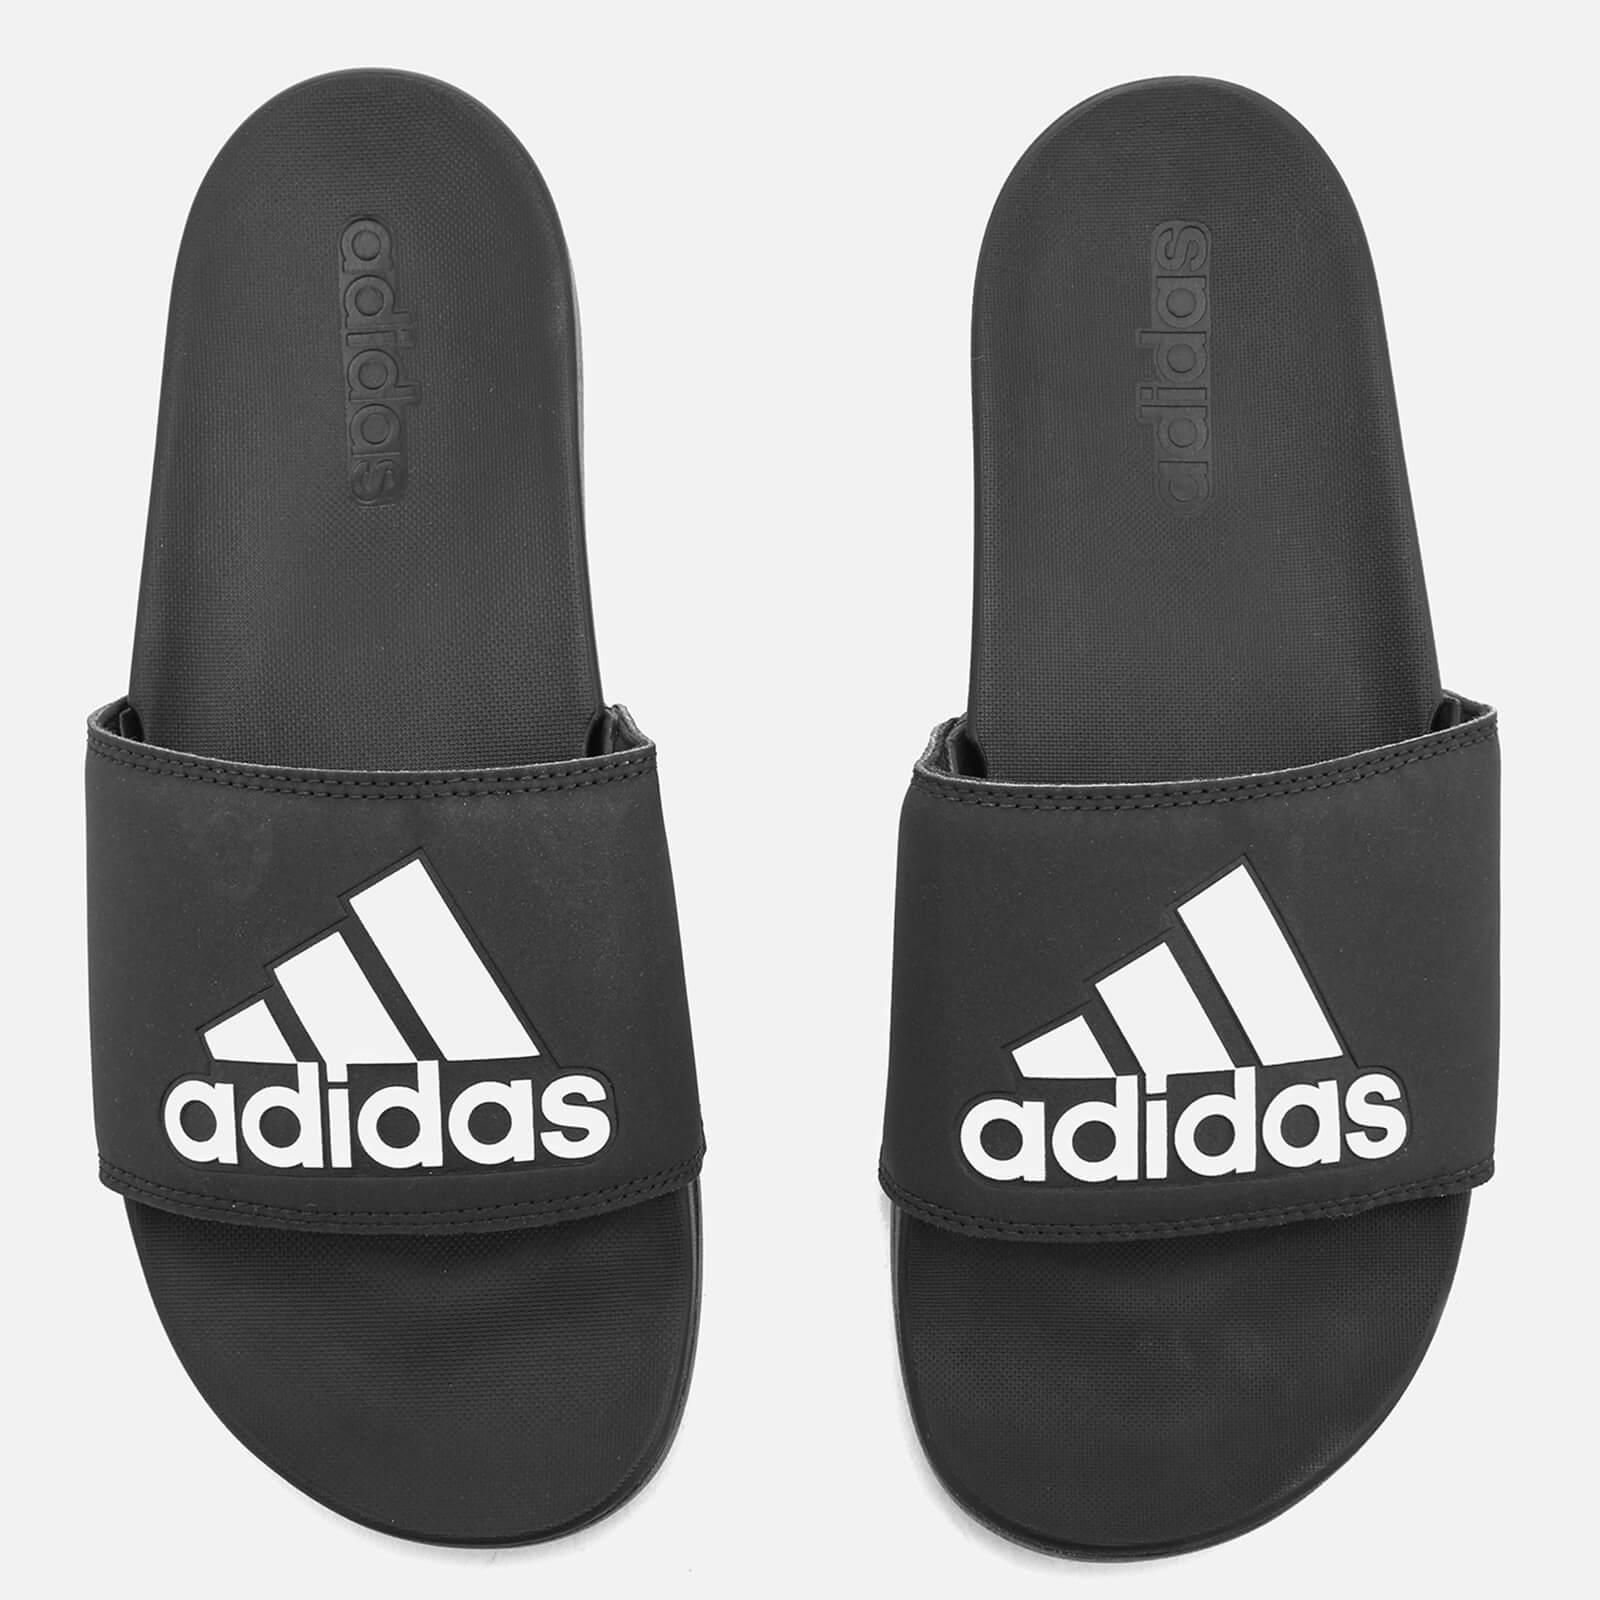 0efc7c43f689 adidas Men s Adilette Logo Slide Sandals - Core Black Sports   Leisure